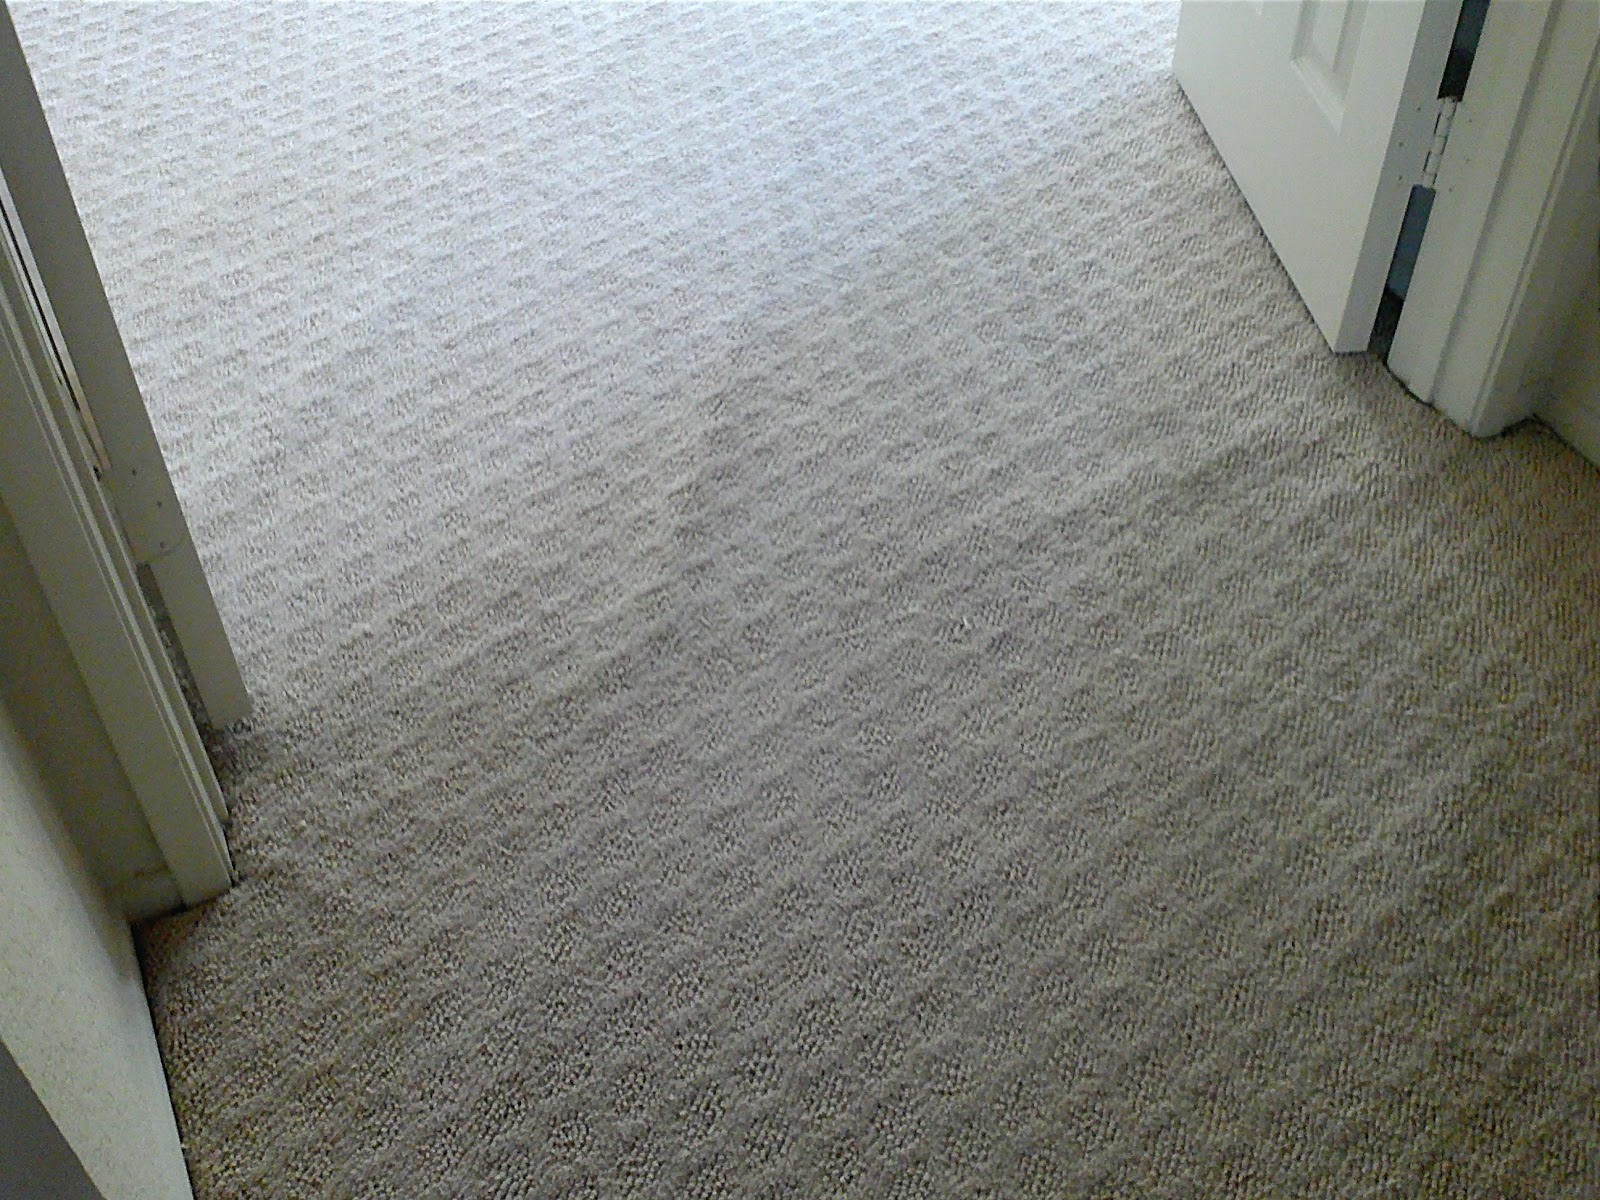 Oh My God my carpet has ripples!